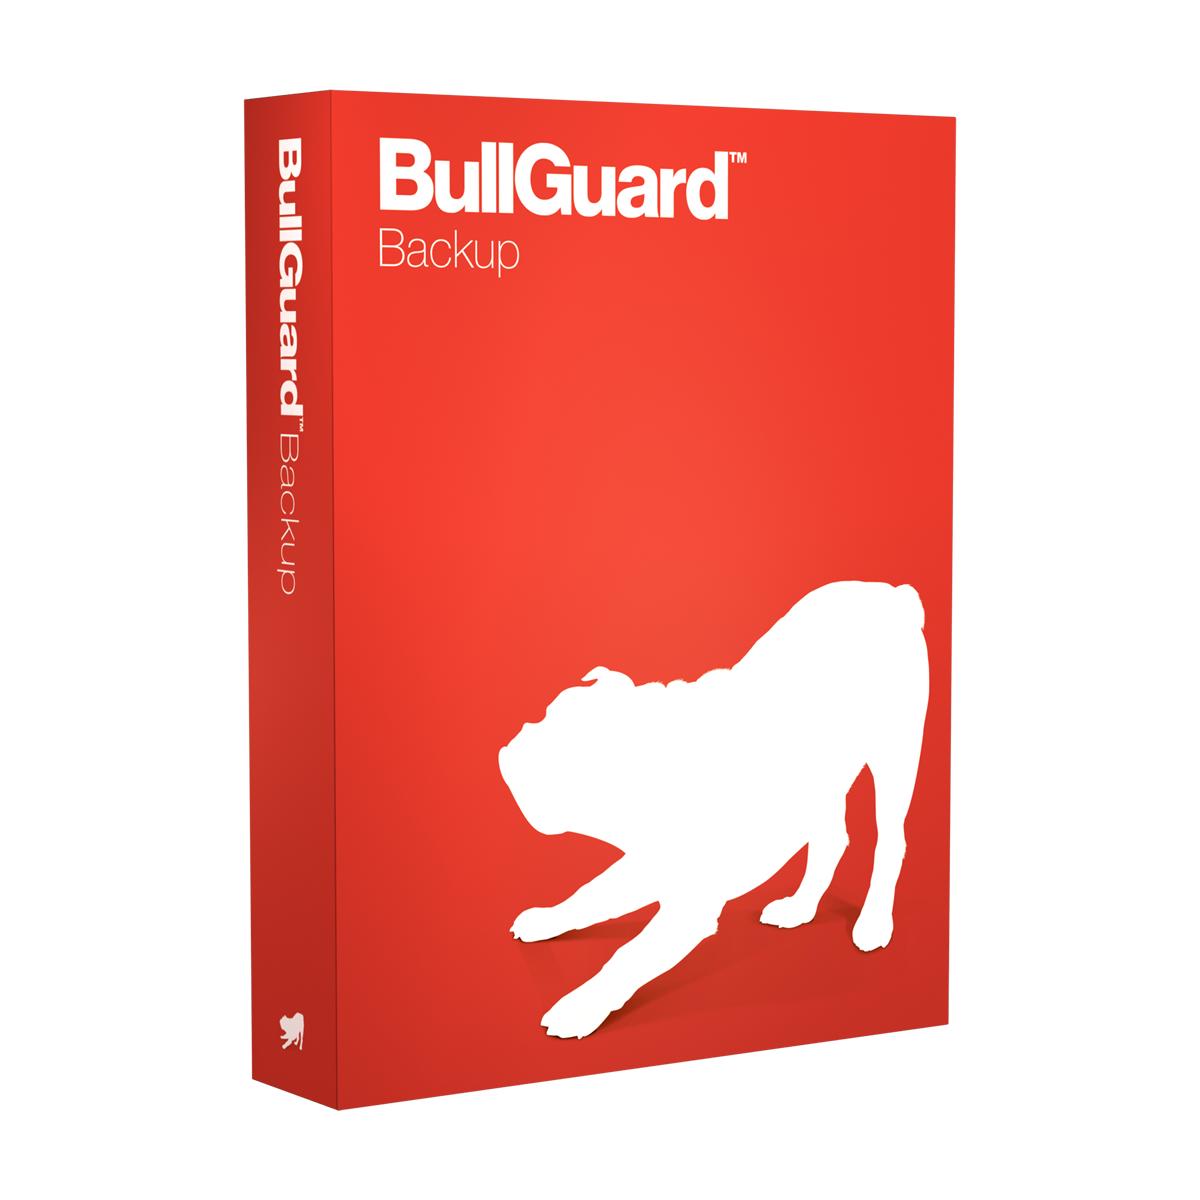 Bullguard Backup